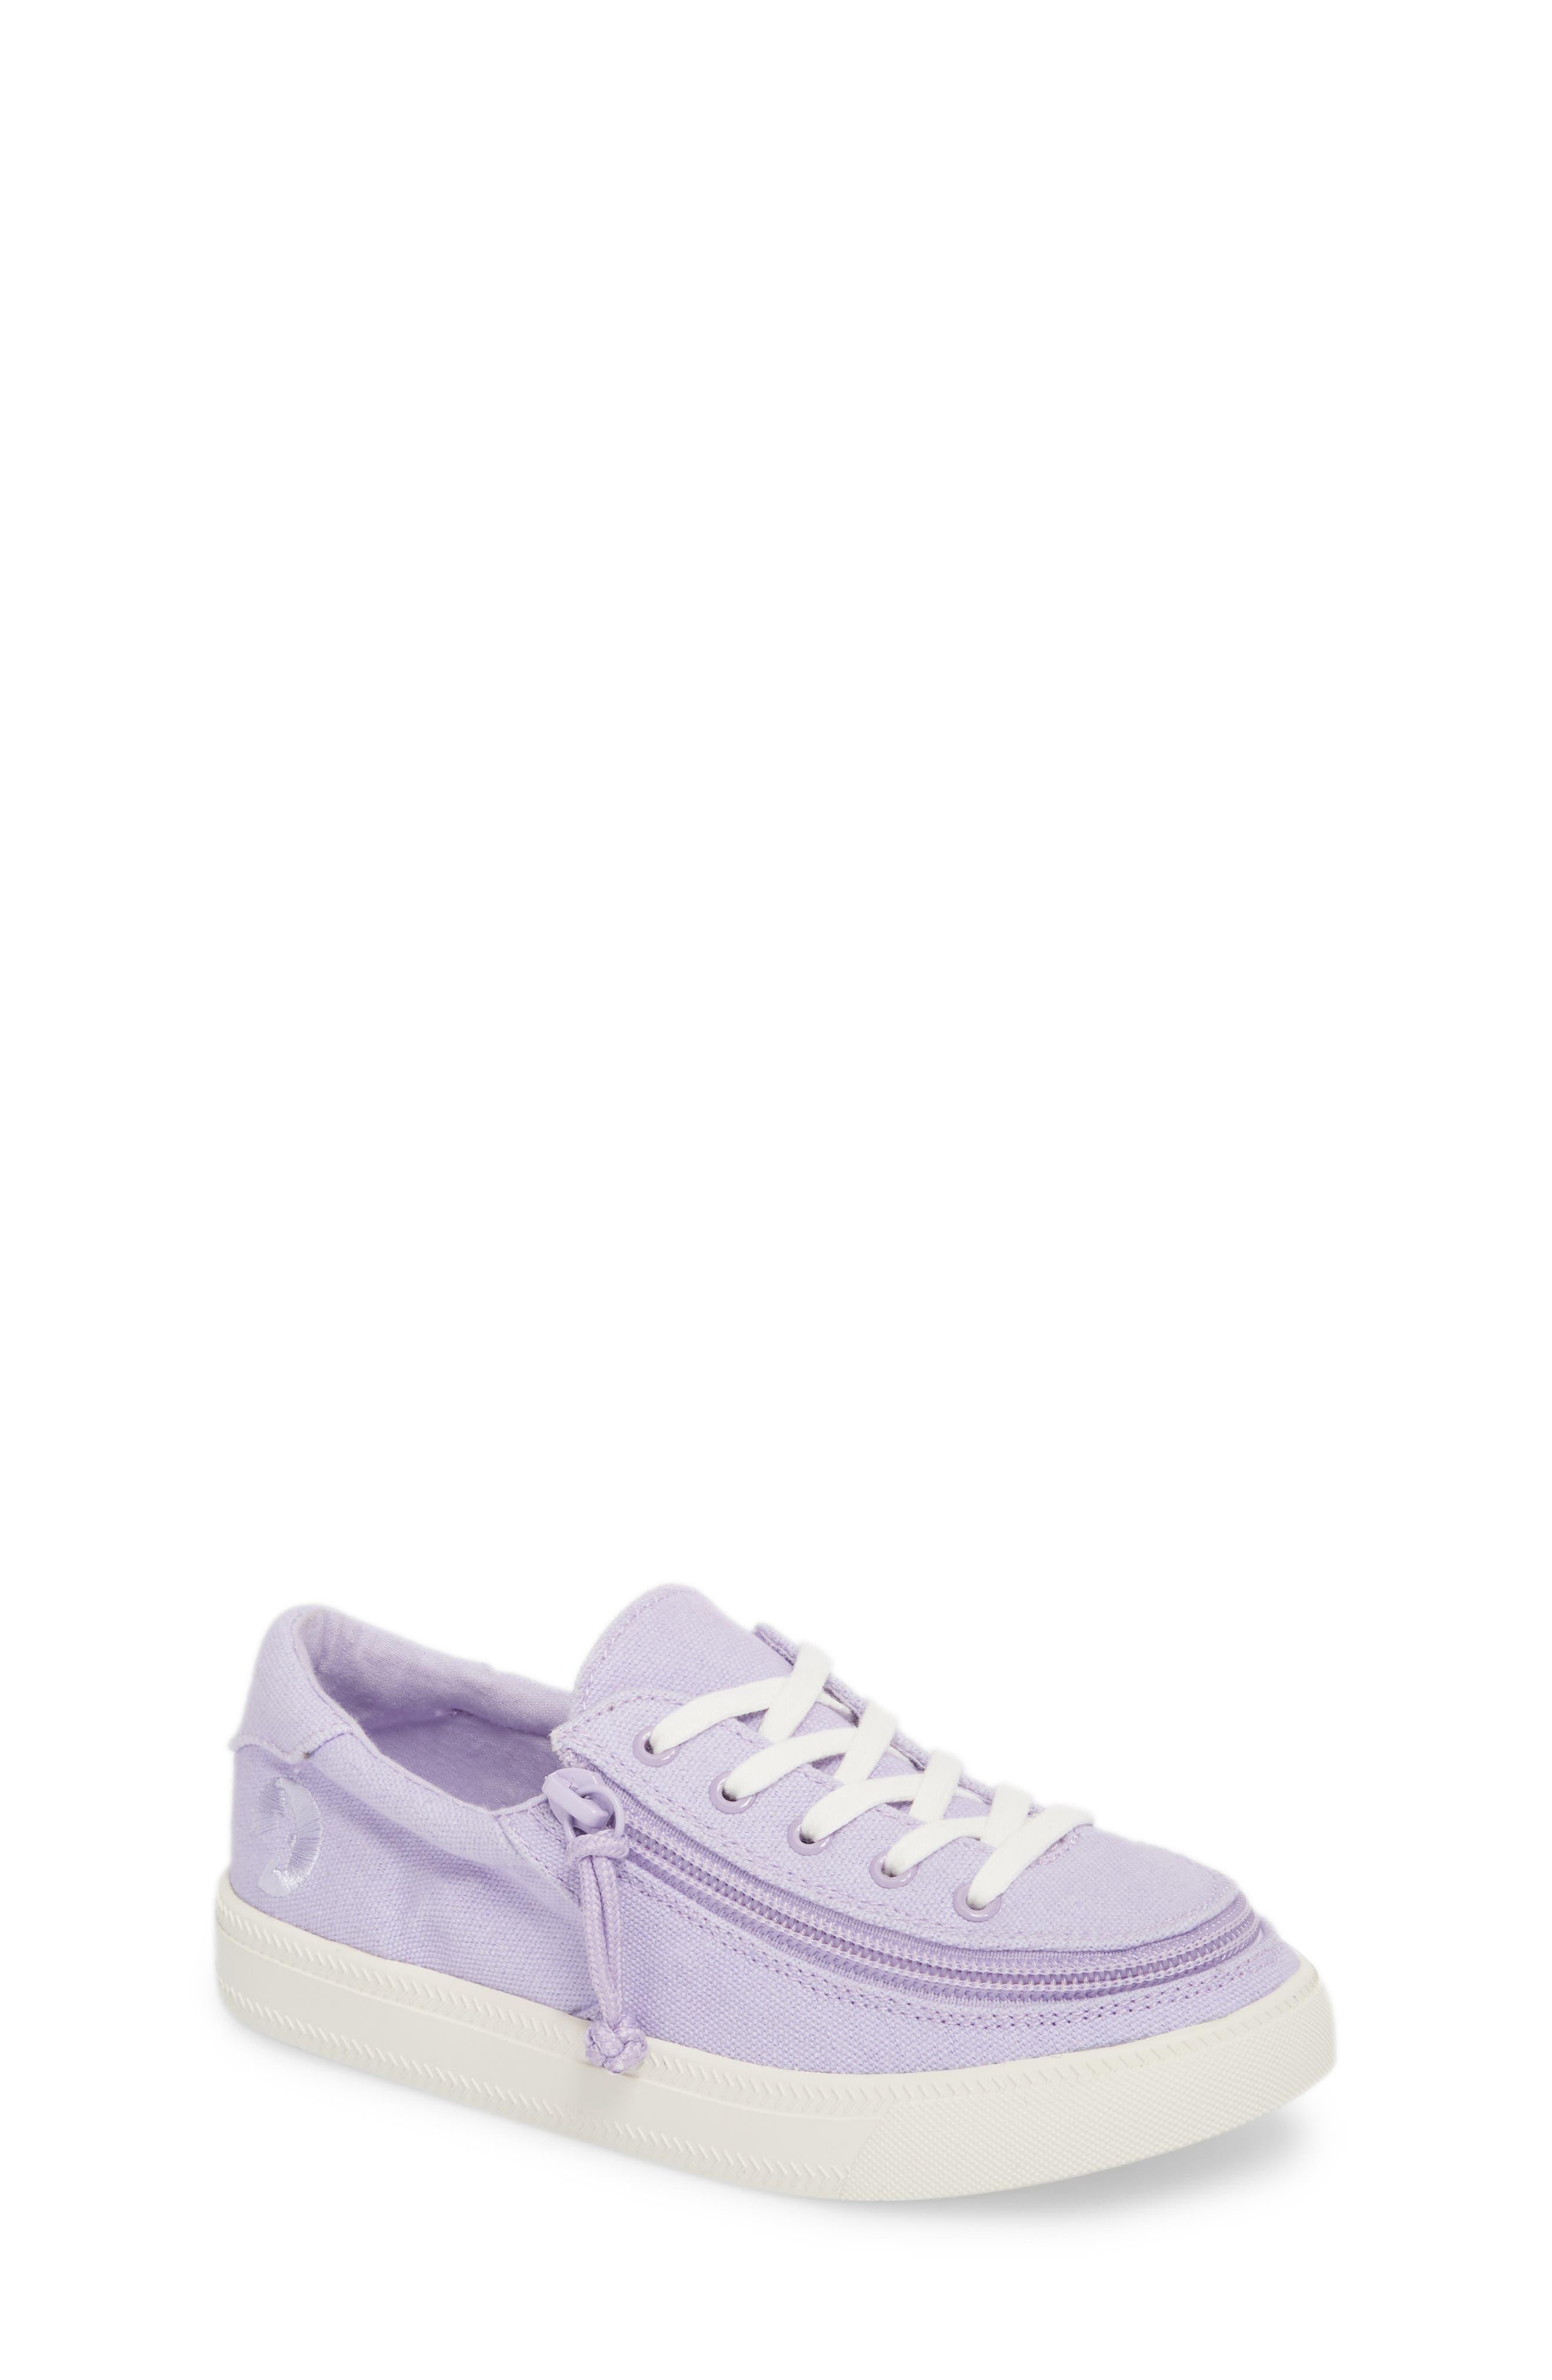 BILLY FOOTWEAR Classic Zip Around Low Top Sneaker, Main, color, LAVENDER